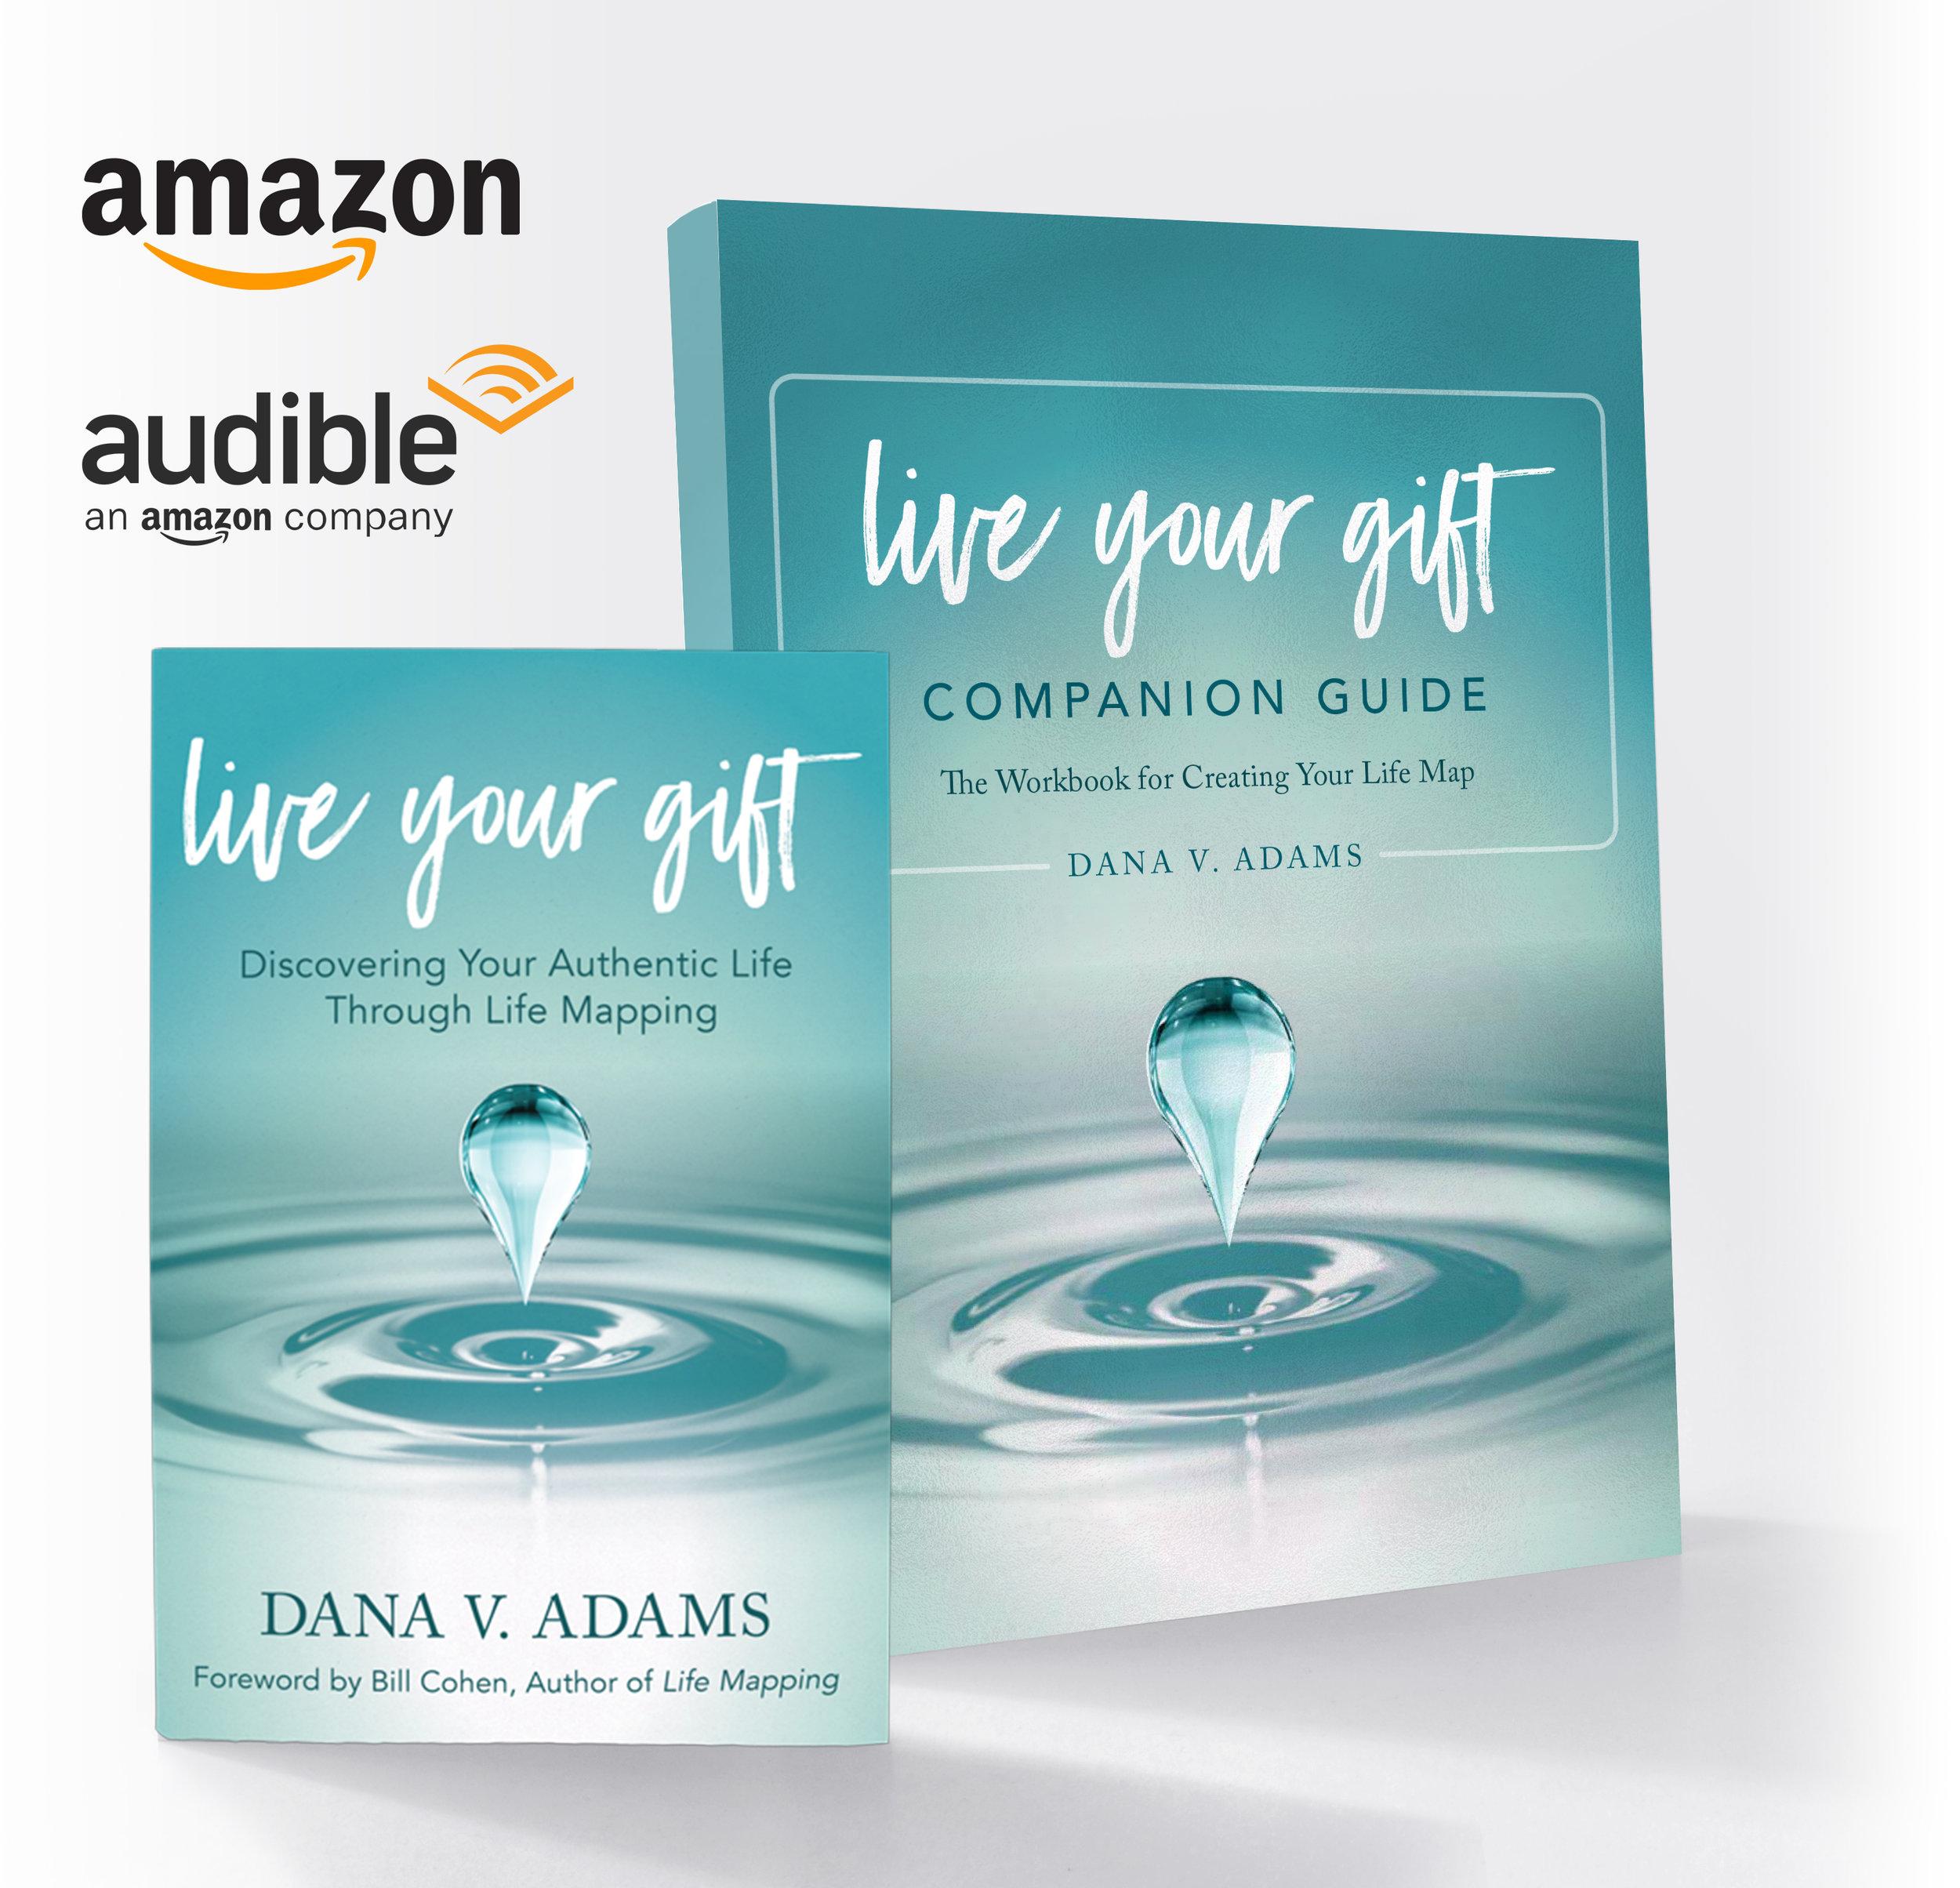 Book-and-Guide-Amazon-&-Audible-mockup.jpg